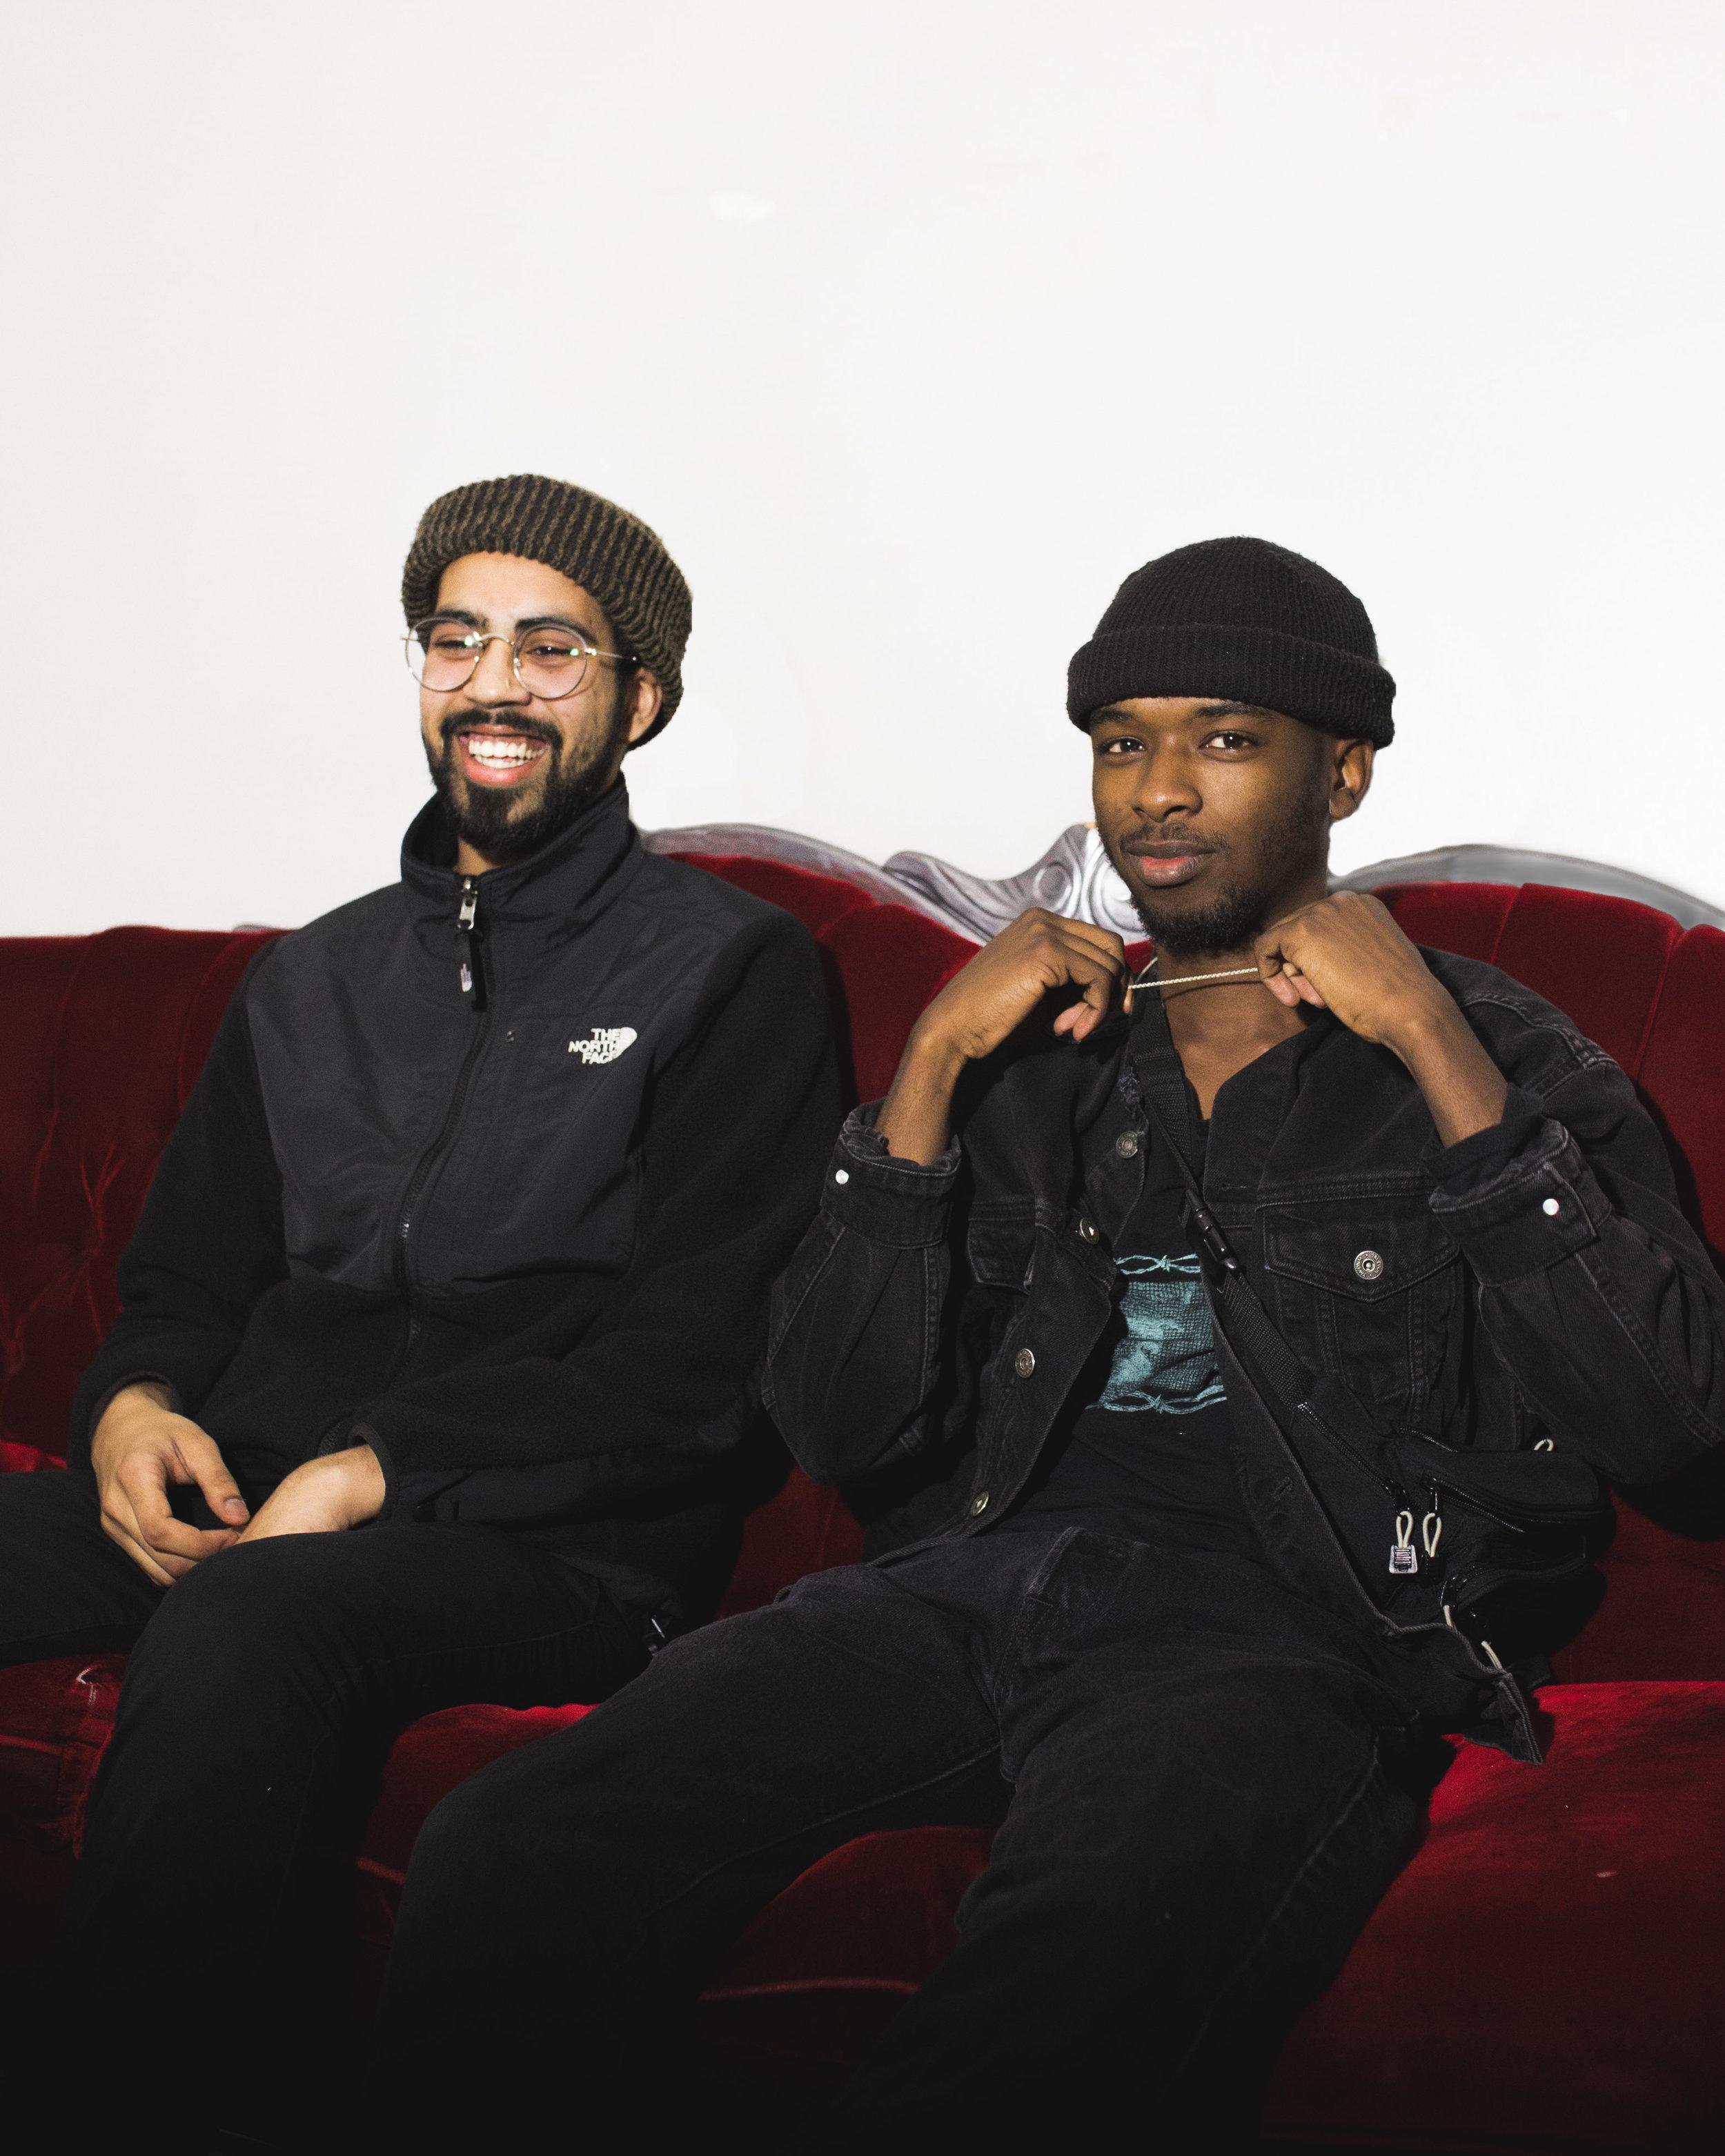 Abdullah (left) & Kafayé (right). Photo by @_kevinfall.